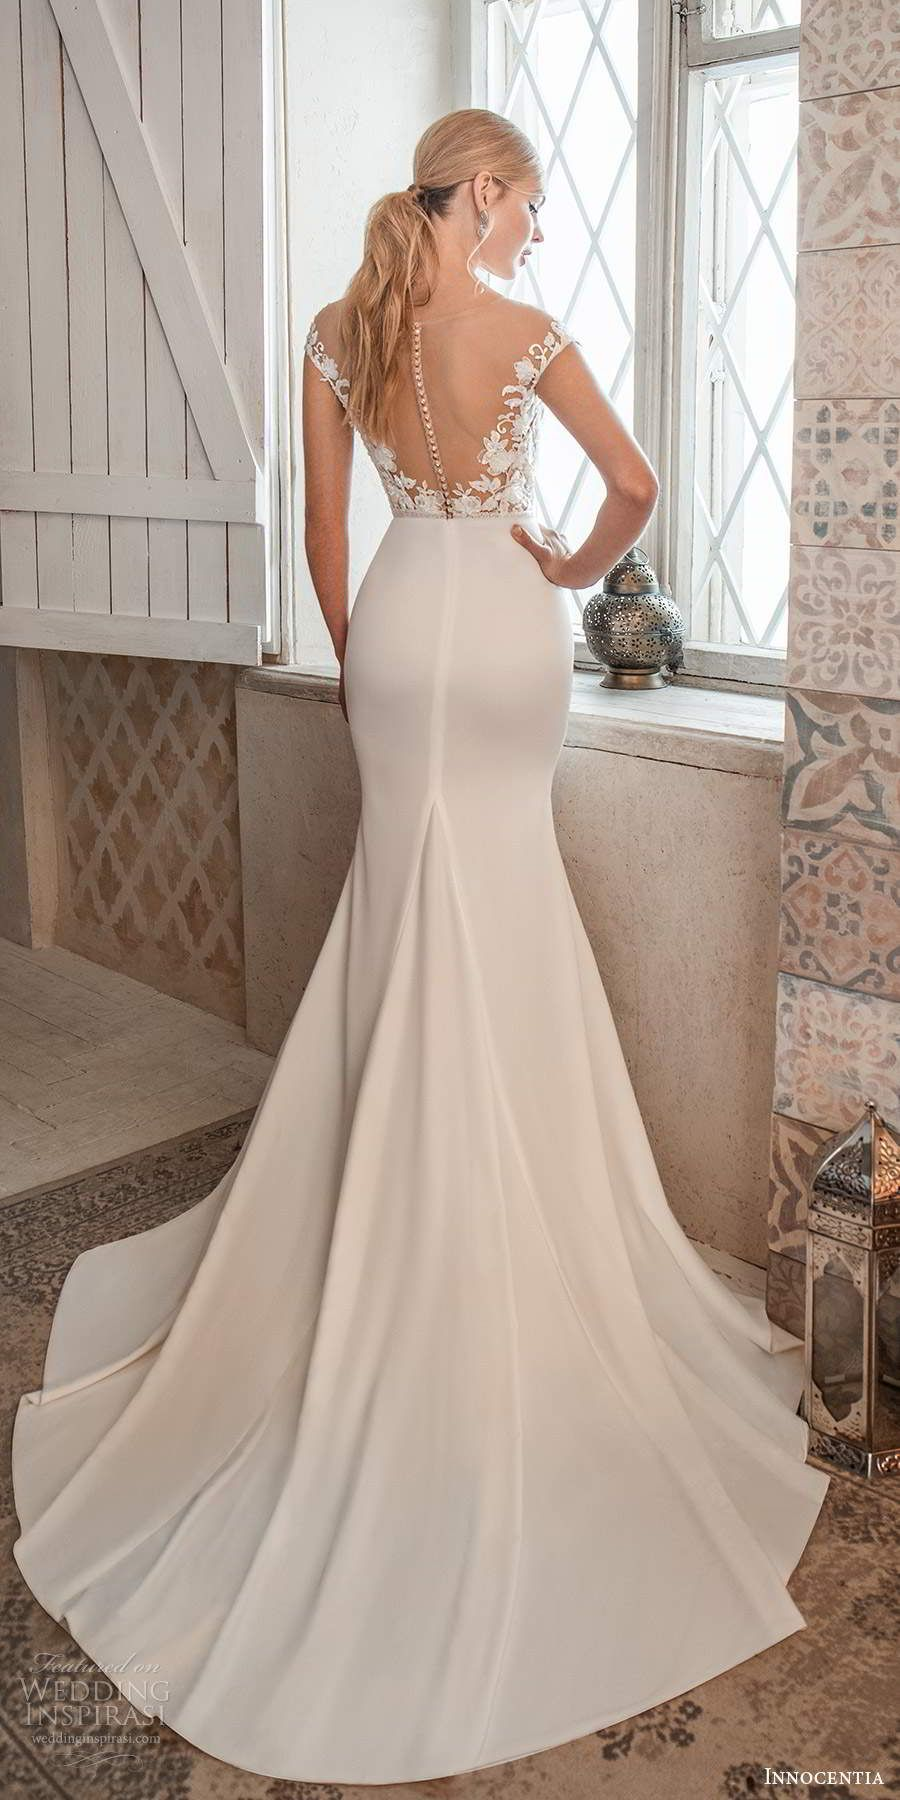 "Innocentia 2021 Wedding Dresses — ""Casablanca"" Bridal"